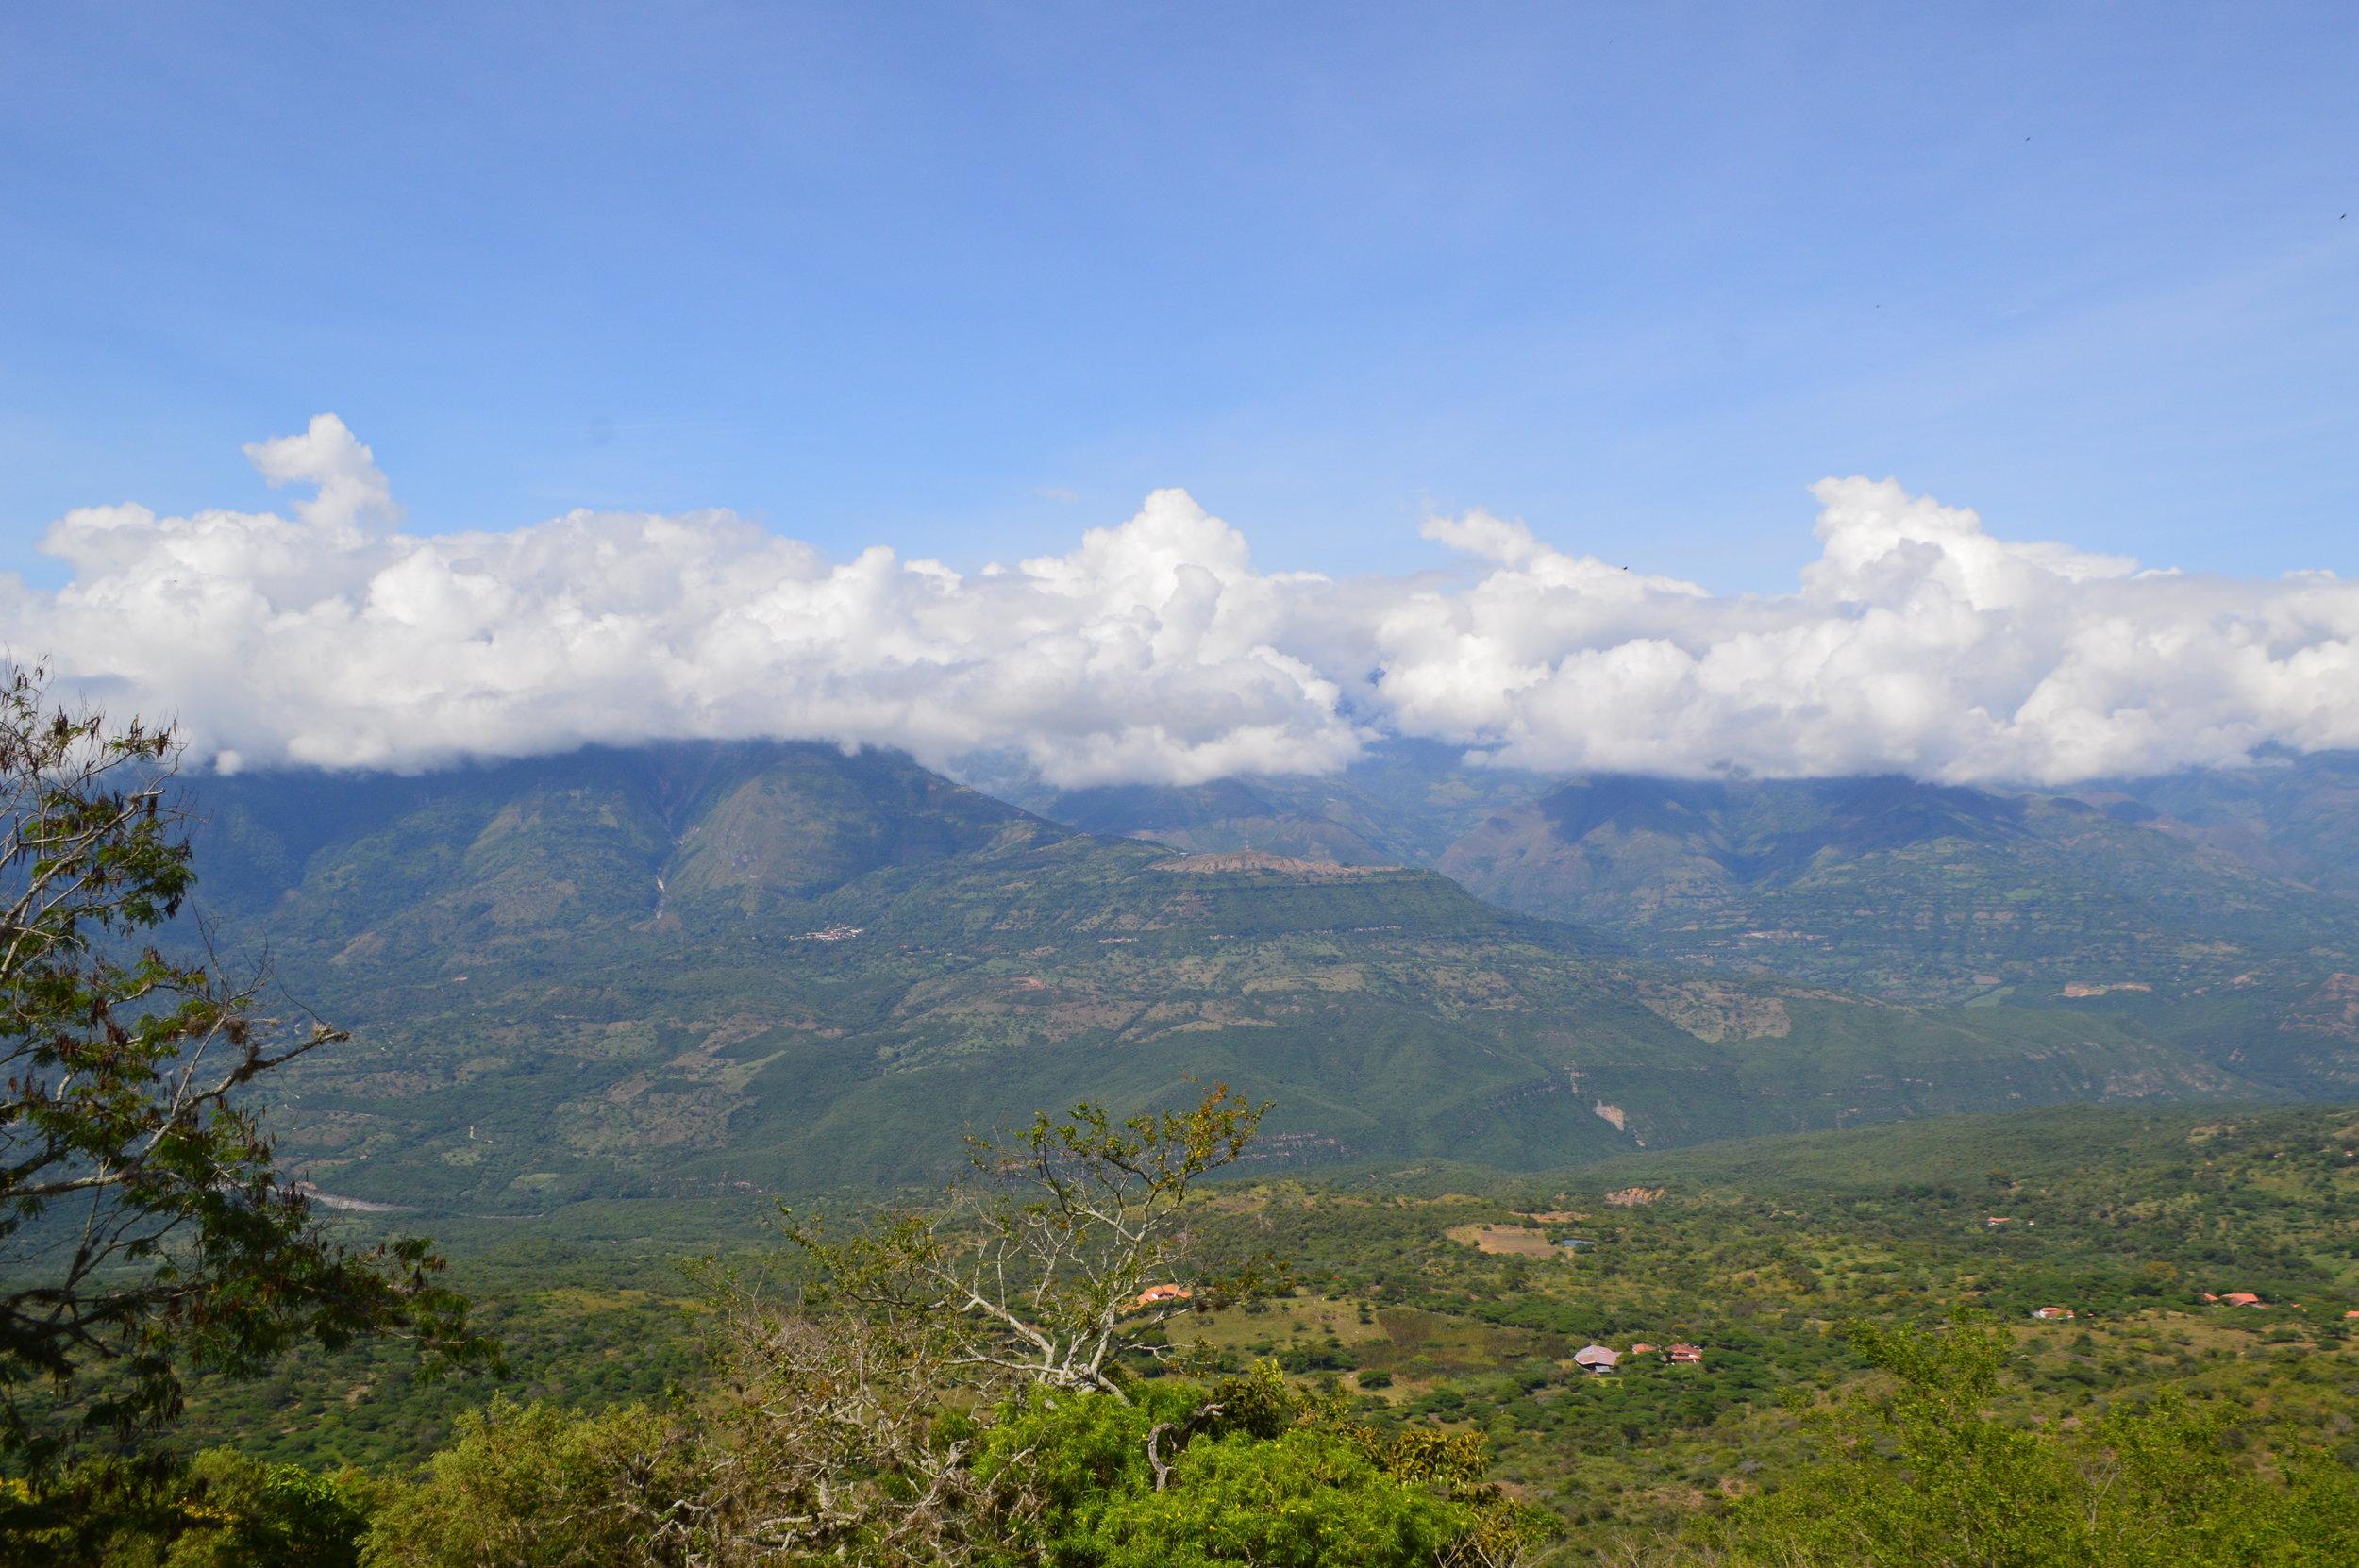 View from Salto de Mico